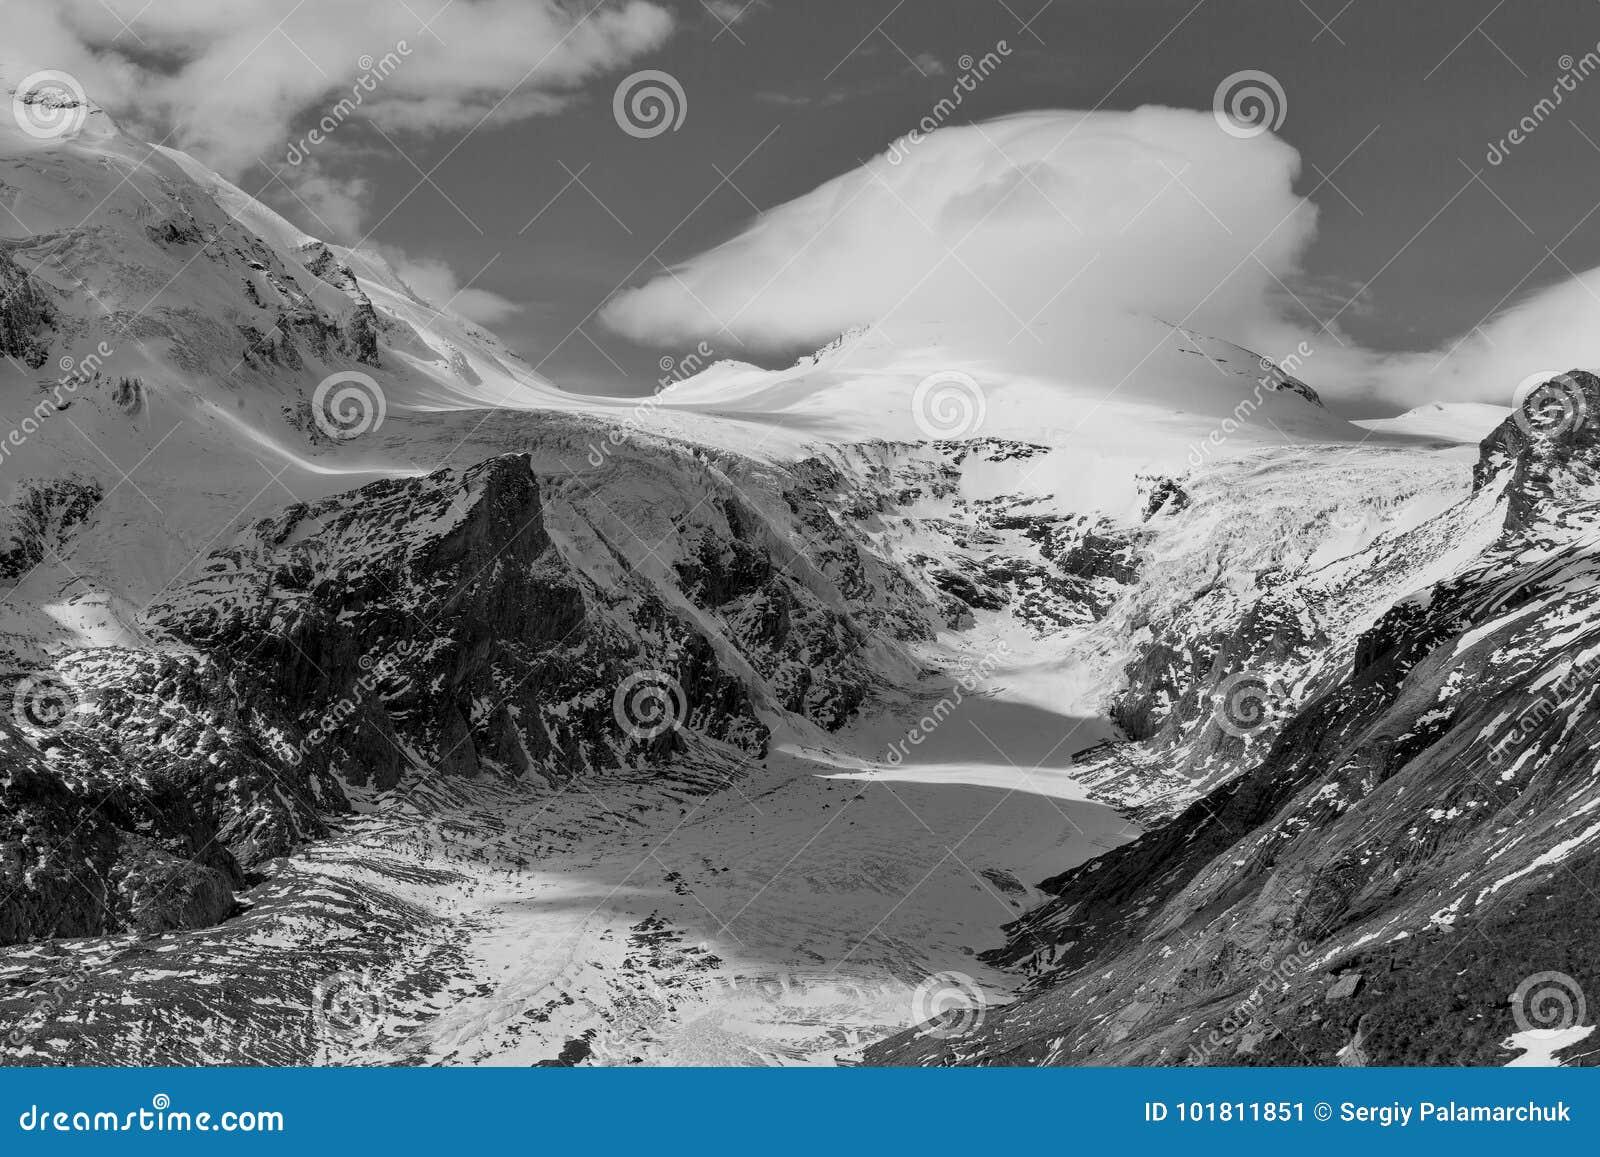 Kaiser franz josef glacier grossglockner austrian alps black and white